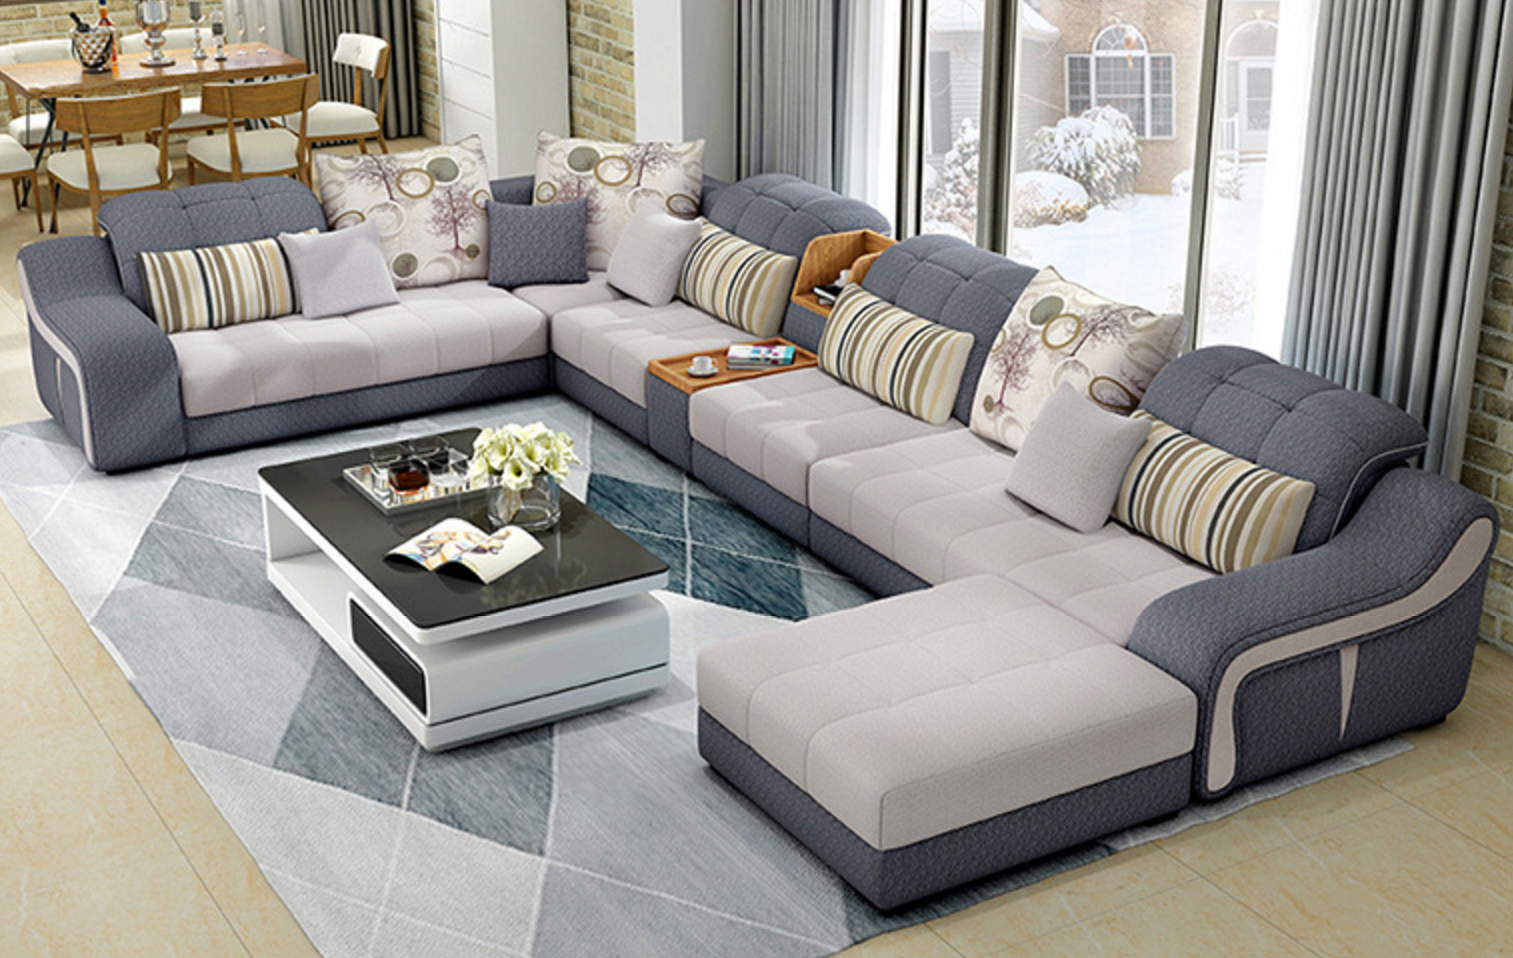 Learn How To Make Your Own Upholstered Headboard Corner Sectional Sofa Living Room Sofa Design Sofa Design